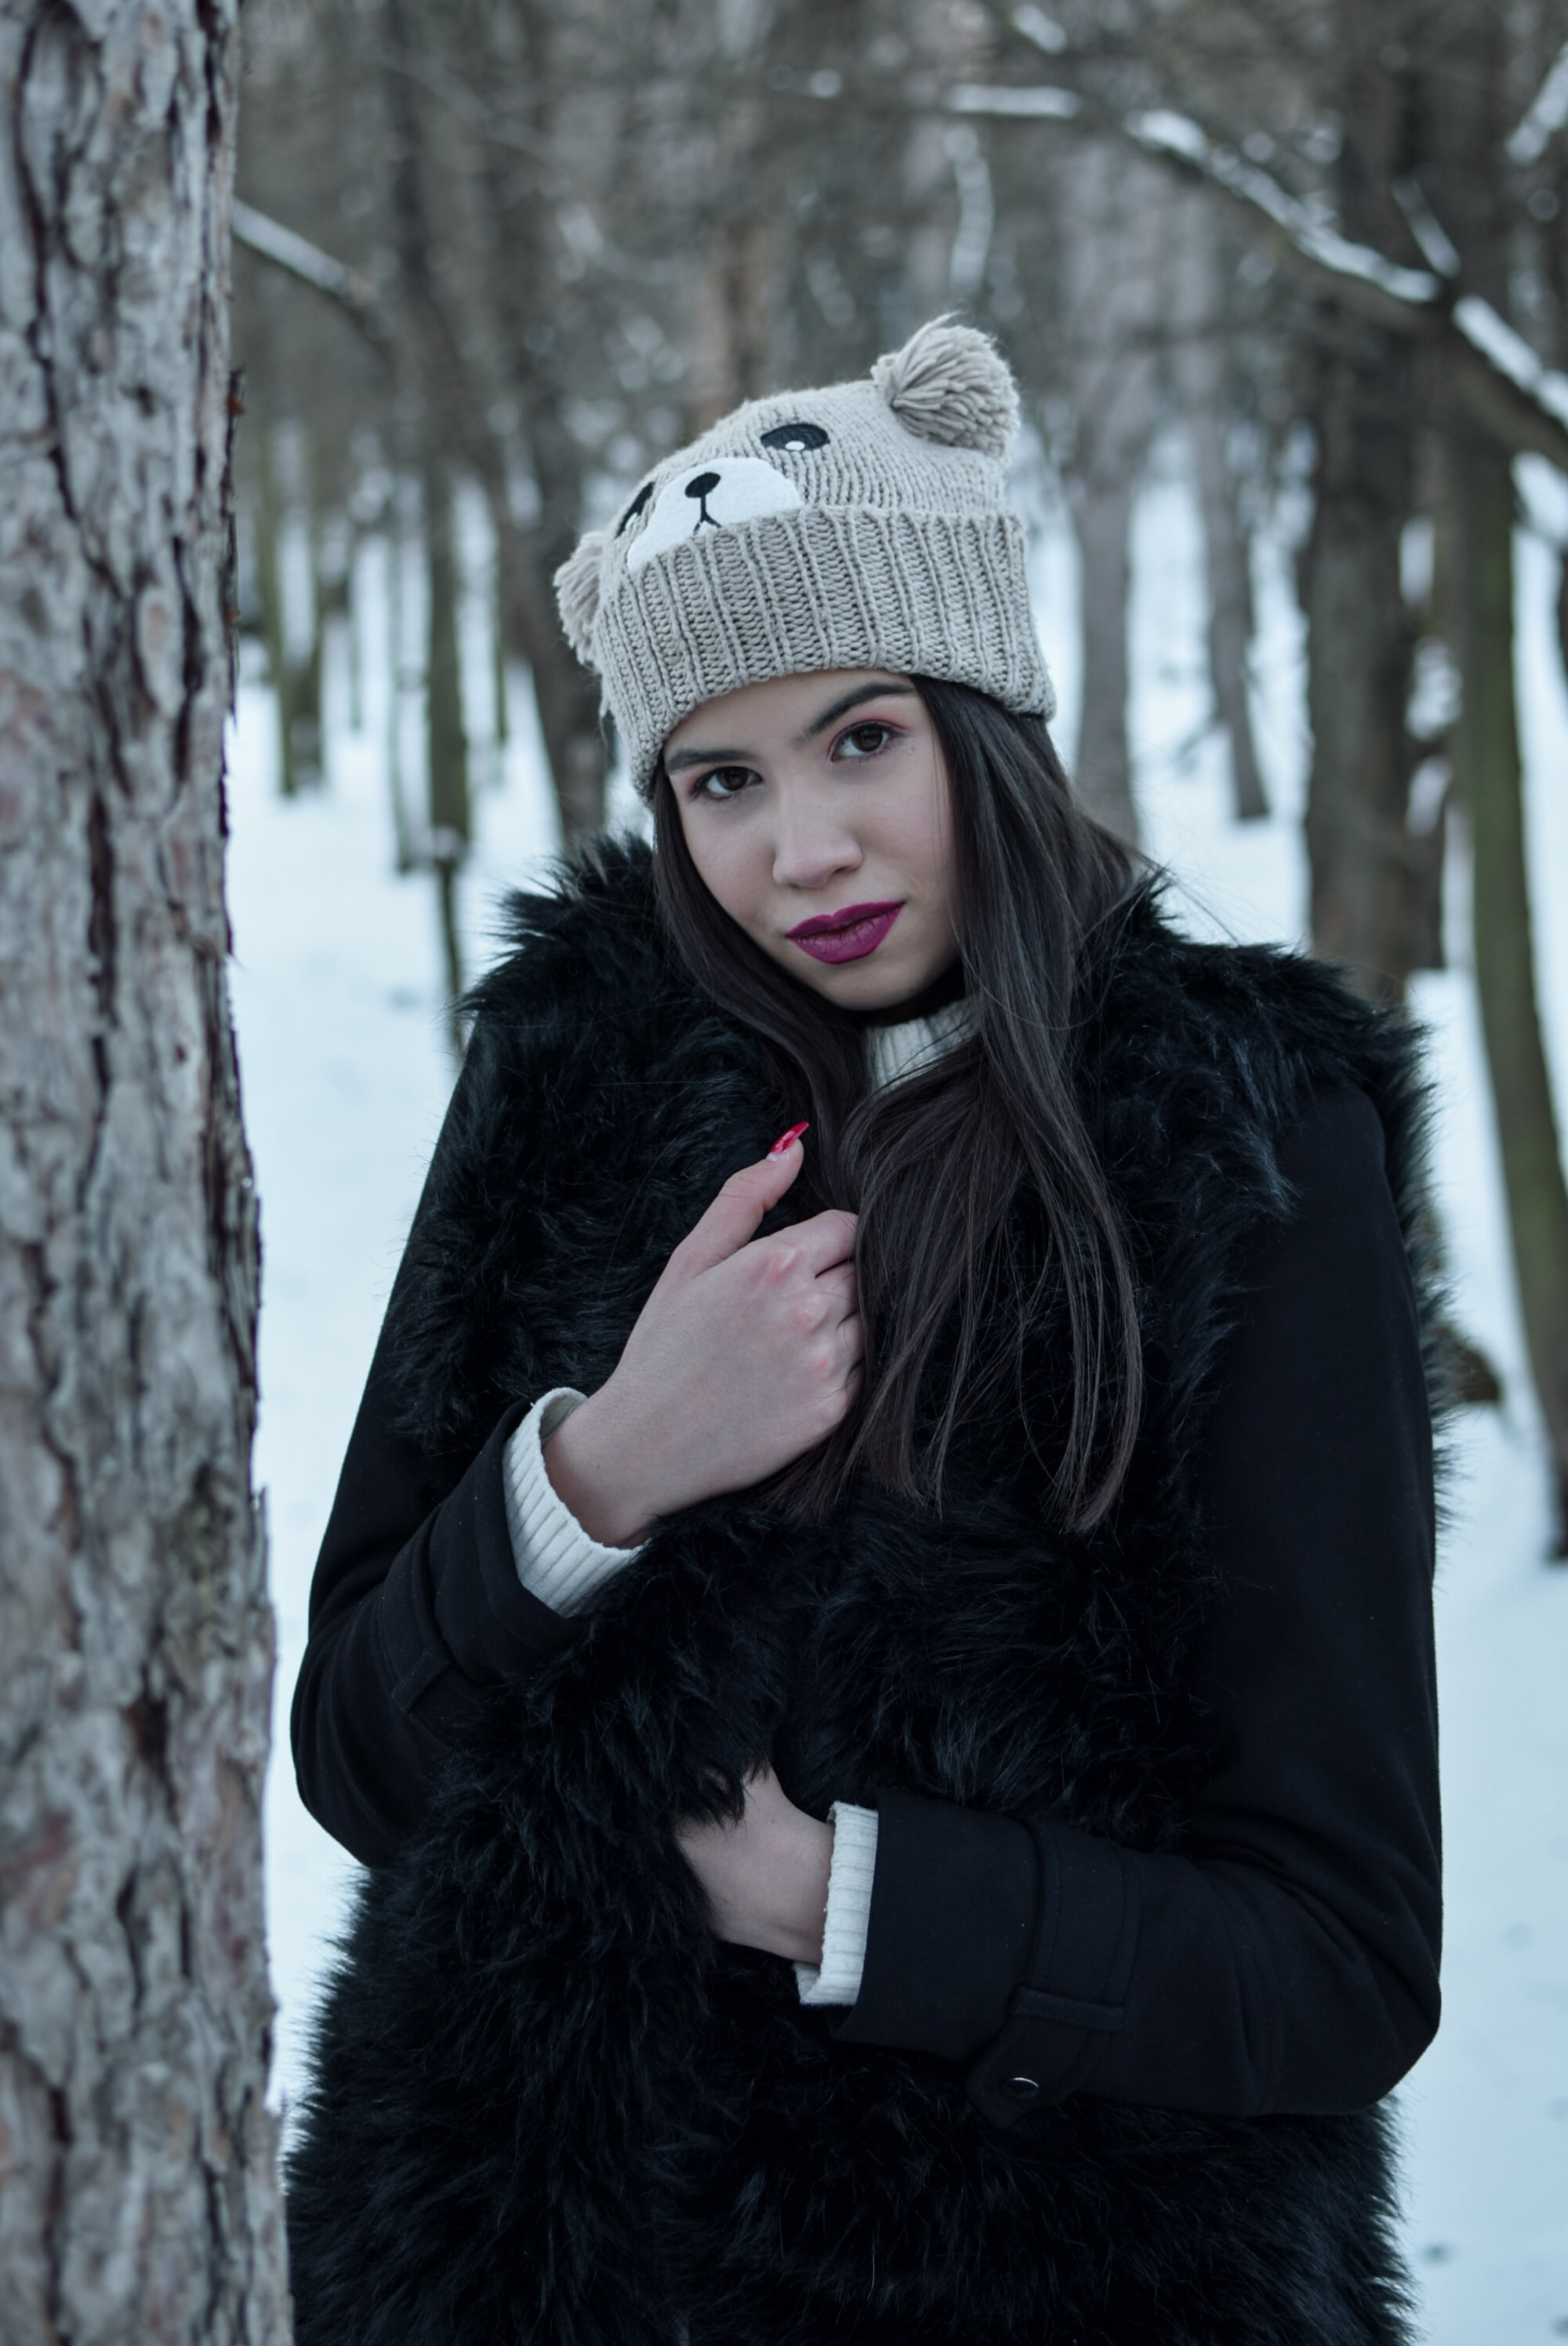 woman wearing black coat and gray bear knit cap standing beside tree